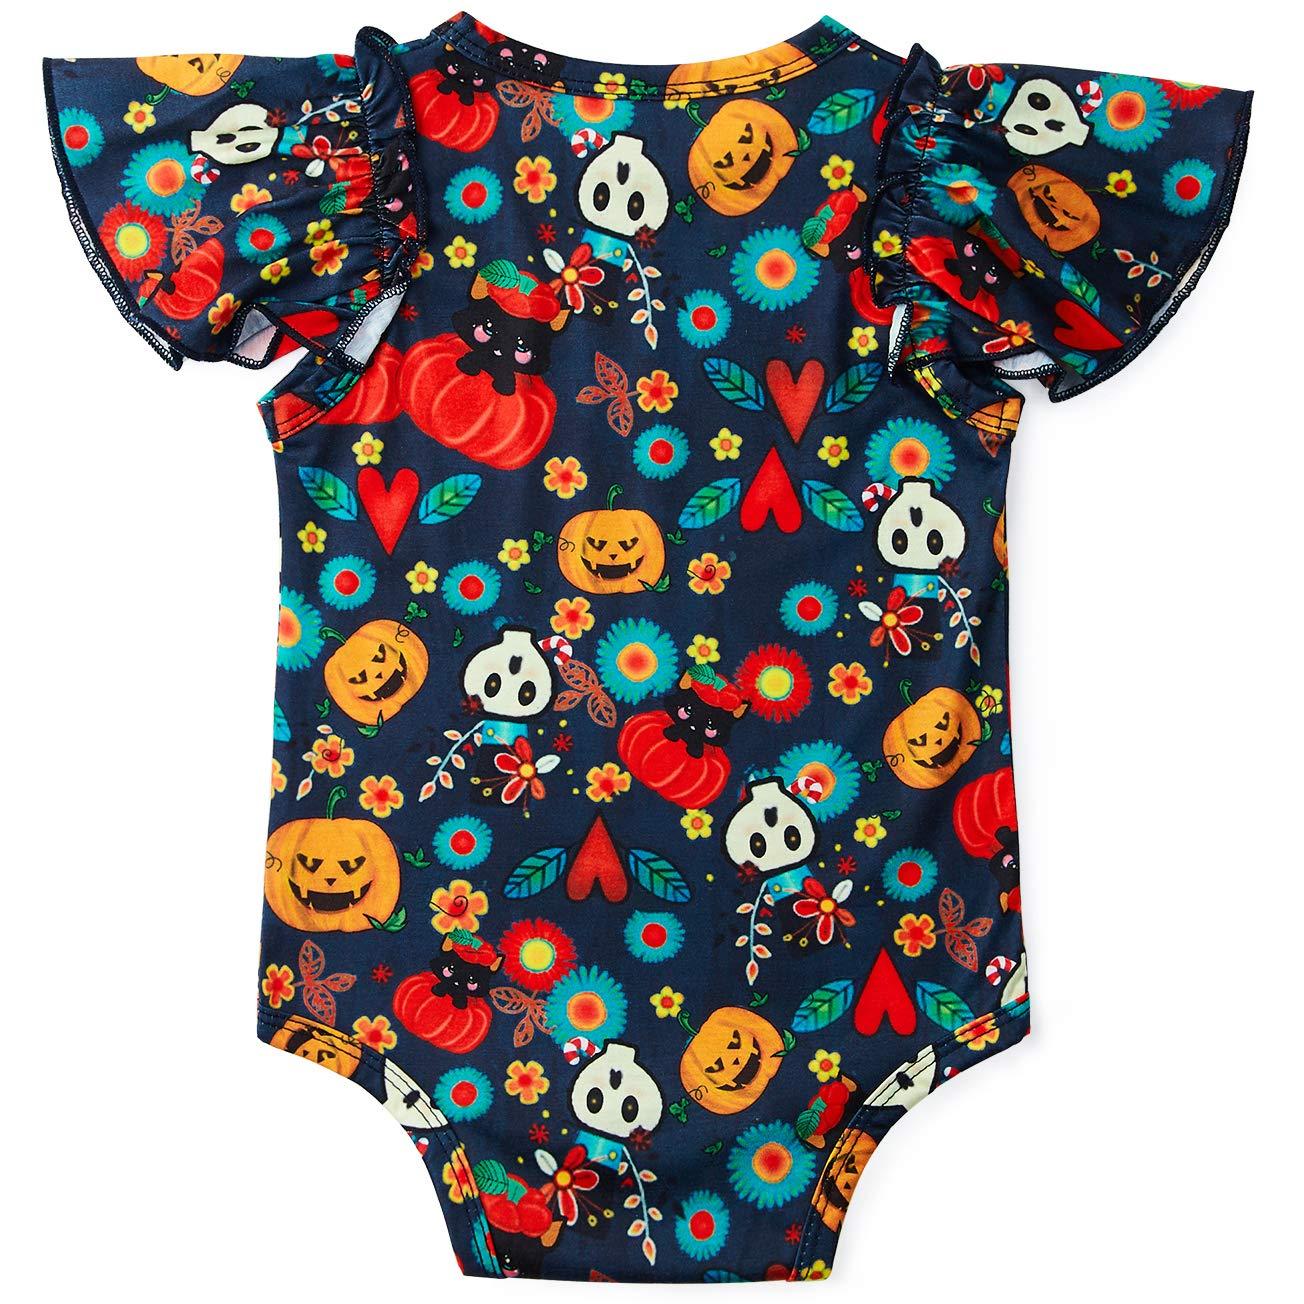 Goodstoworld Baby Ruffle Girl Romper Infant Funny Ghost Festival Graphics Jumpsuit